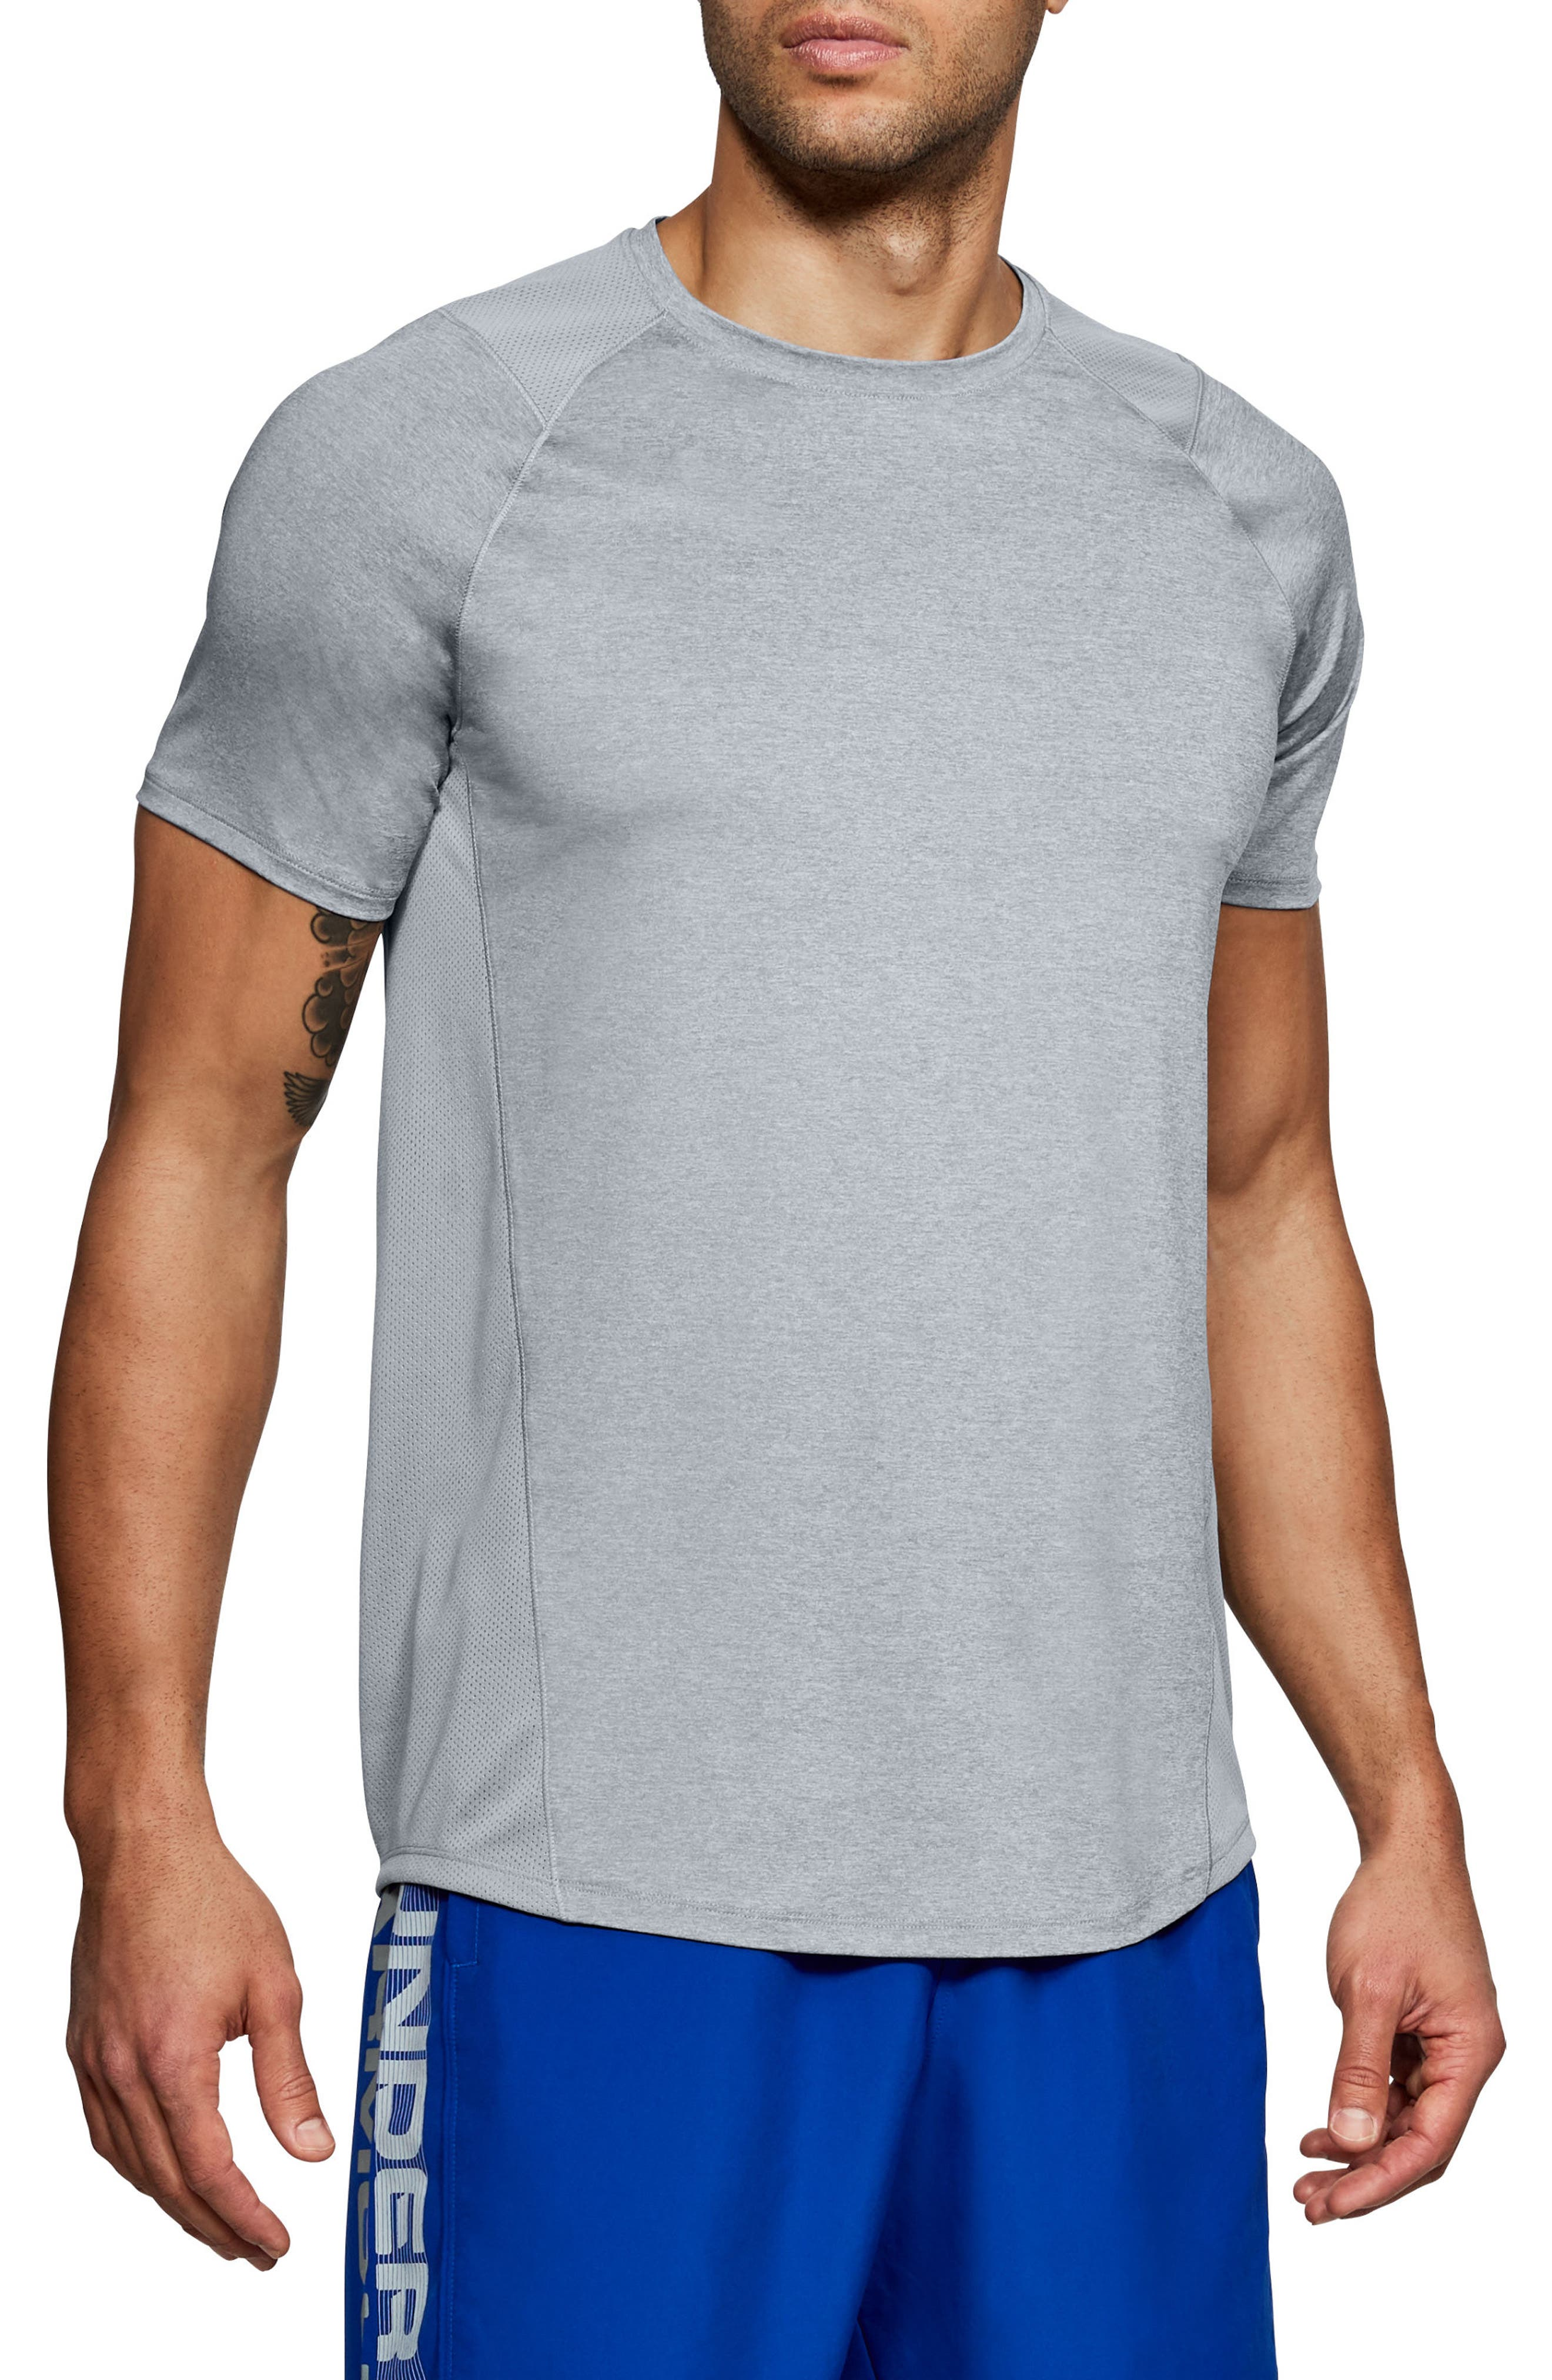 Raid 2.0 Crewneck T-Shirt,                             Main thumbnail 1, color,                             STEEL LIGHT HEATHER/ GRAPHITE